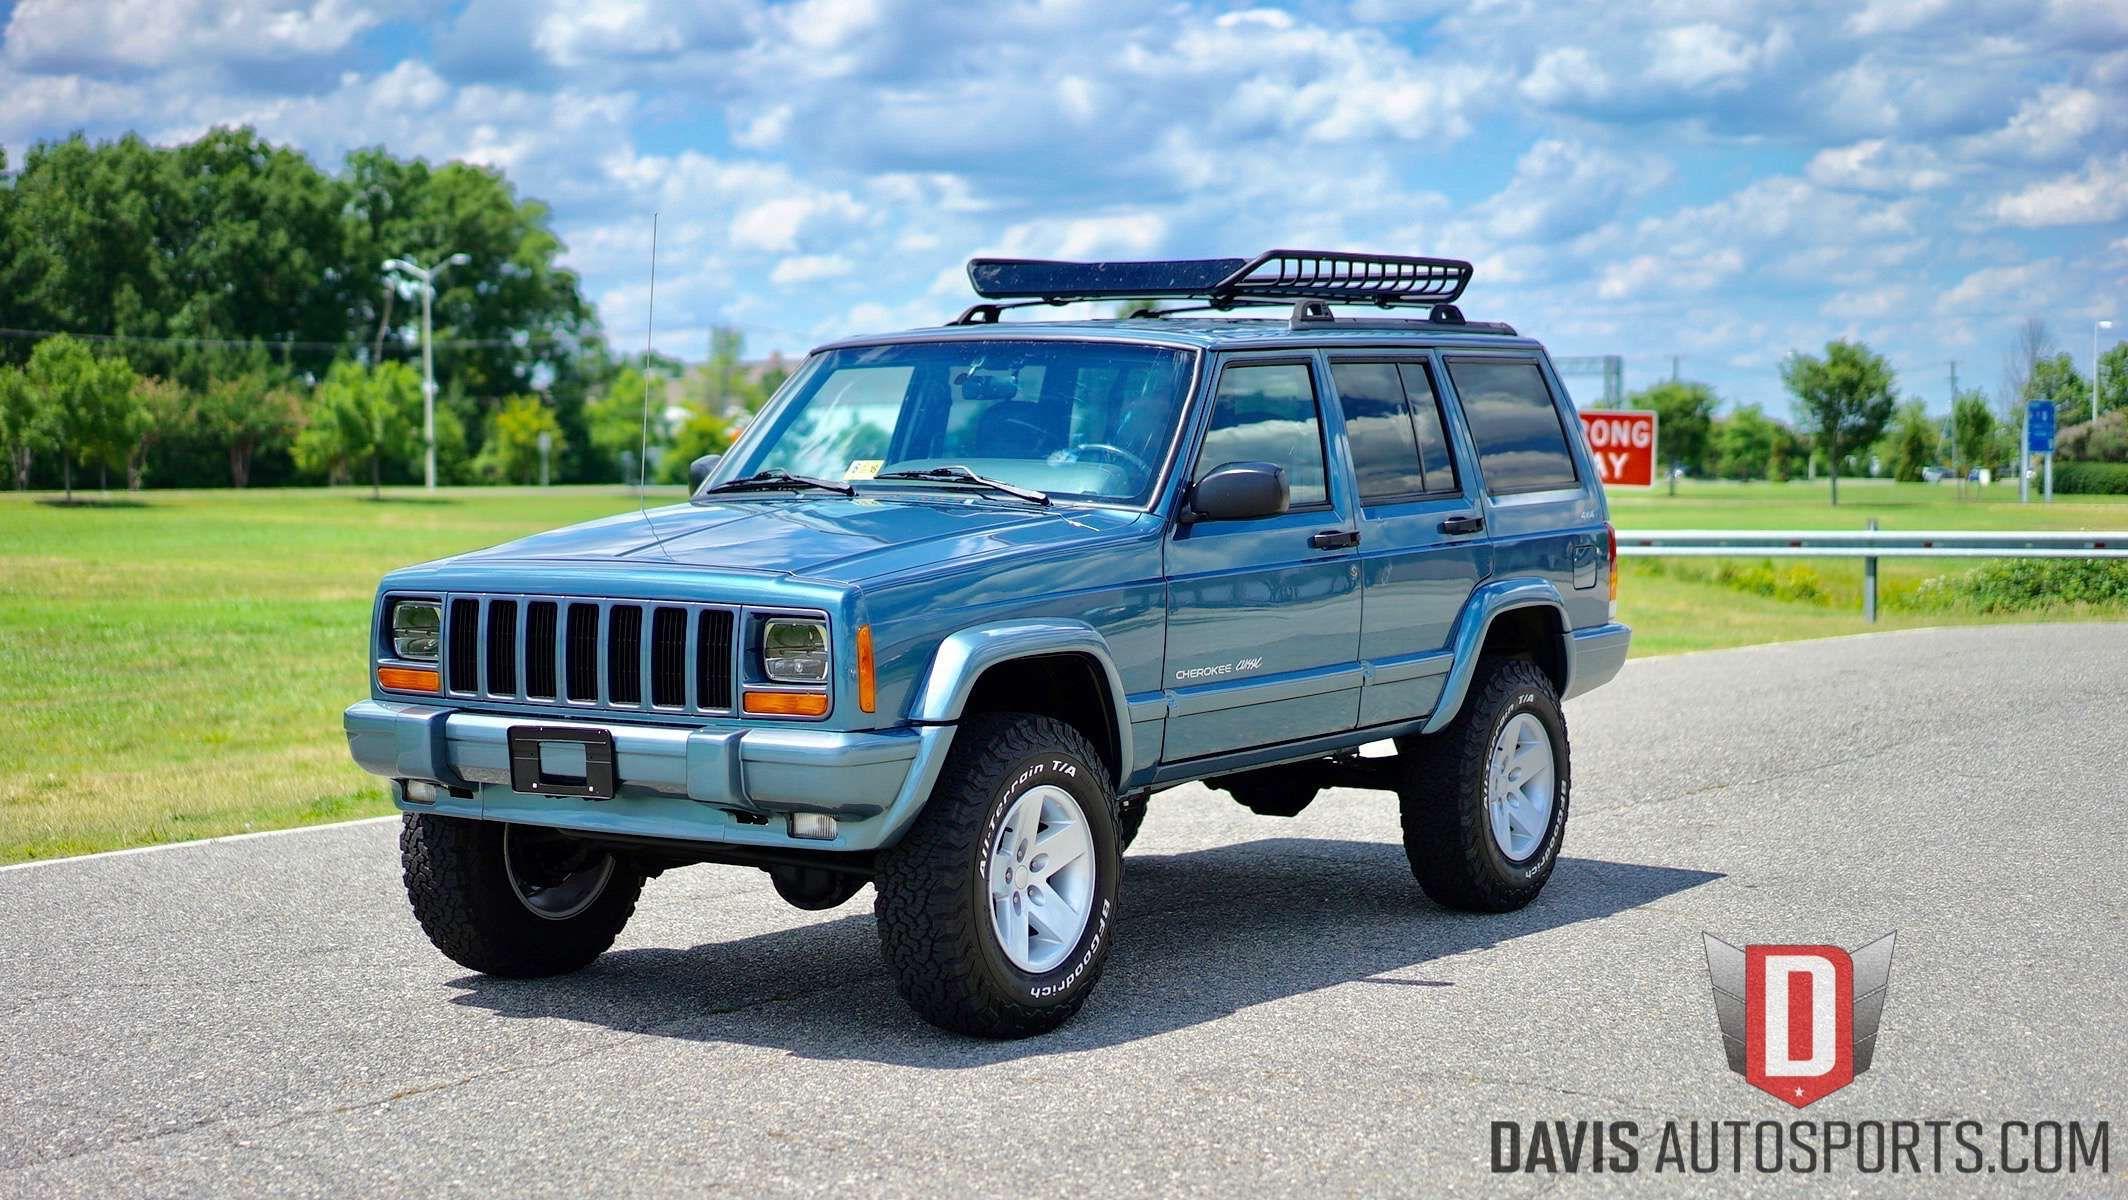 Lifted Jeep Cherokee For Sale 7 24 17 Davis Autosports Jeep Cherokee For Sale Lifted Jeep Cherokee Jeep Cherokee